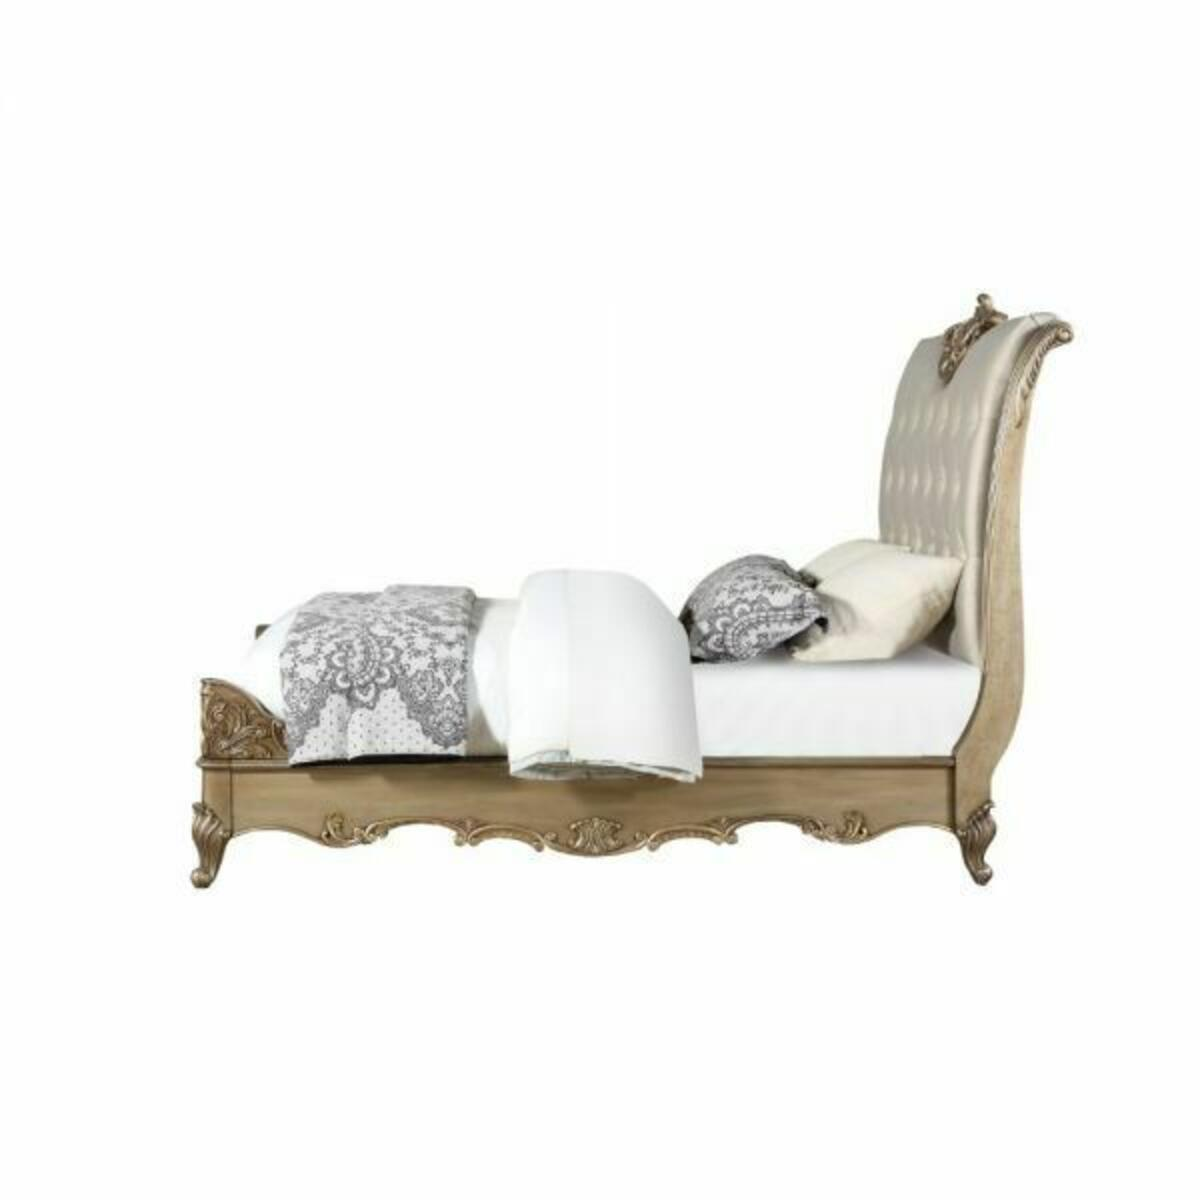 ACME Orianne California King Bed - 23784CK - Champagne PU & Antique Gold